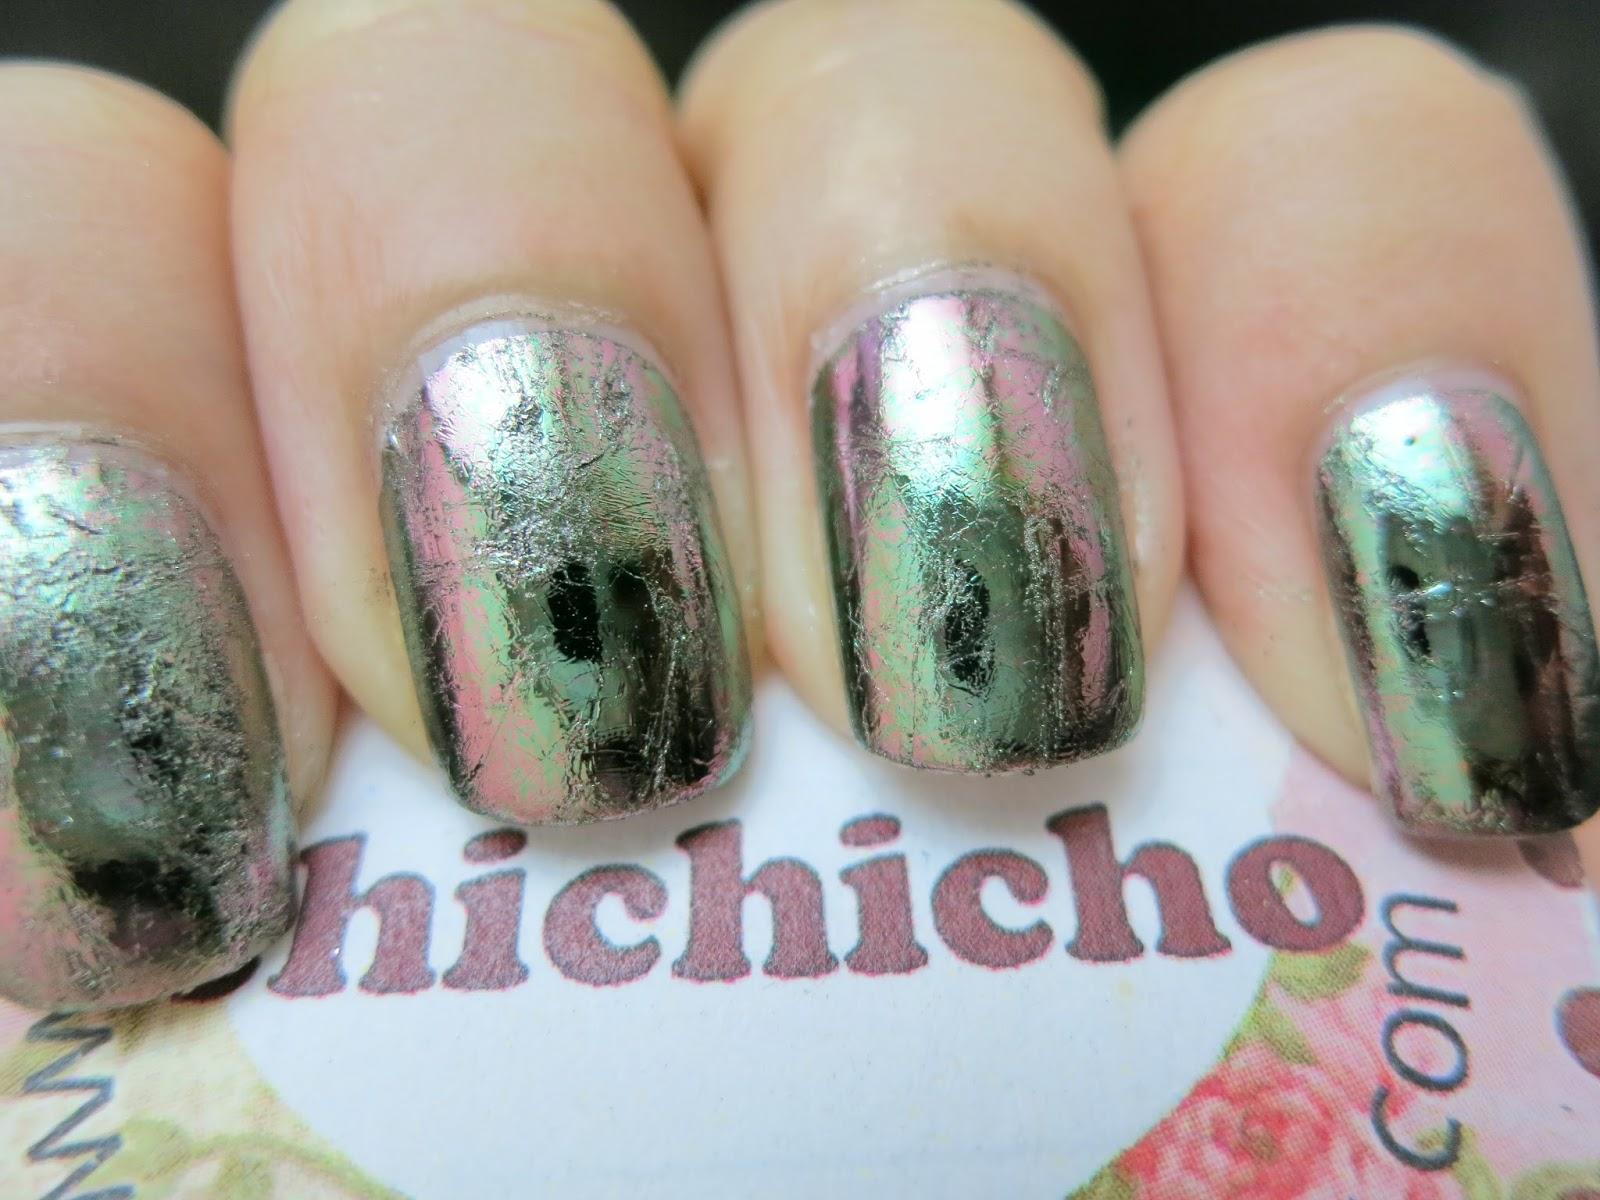 Silver Nail Foil Nail Art Born Pretty Store Review - chichicho~